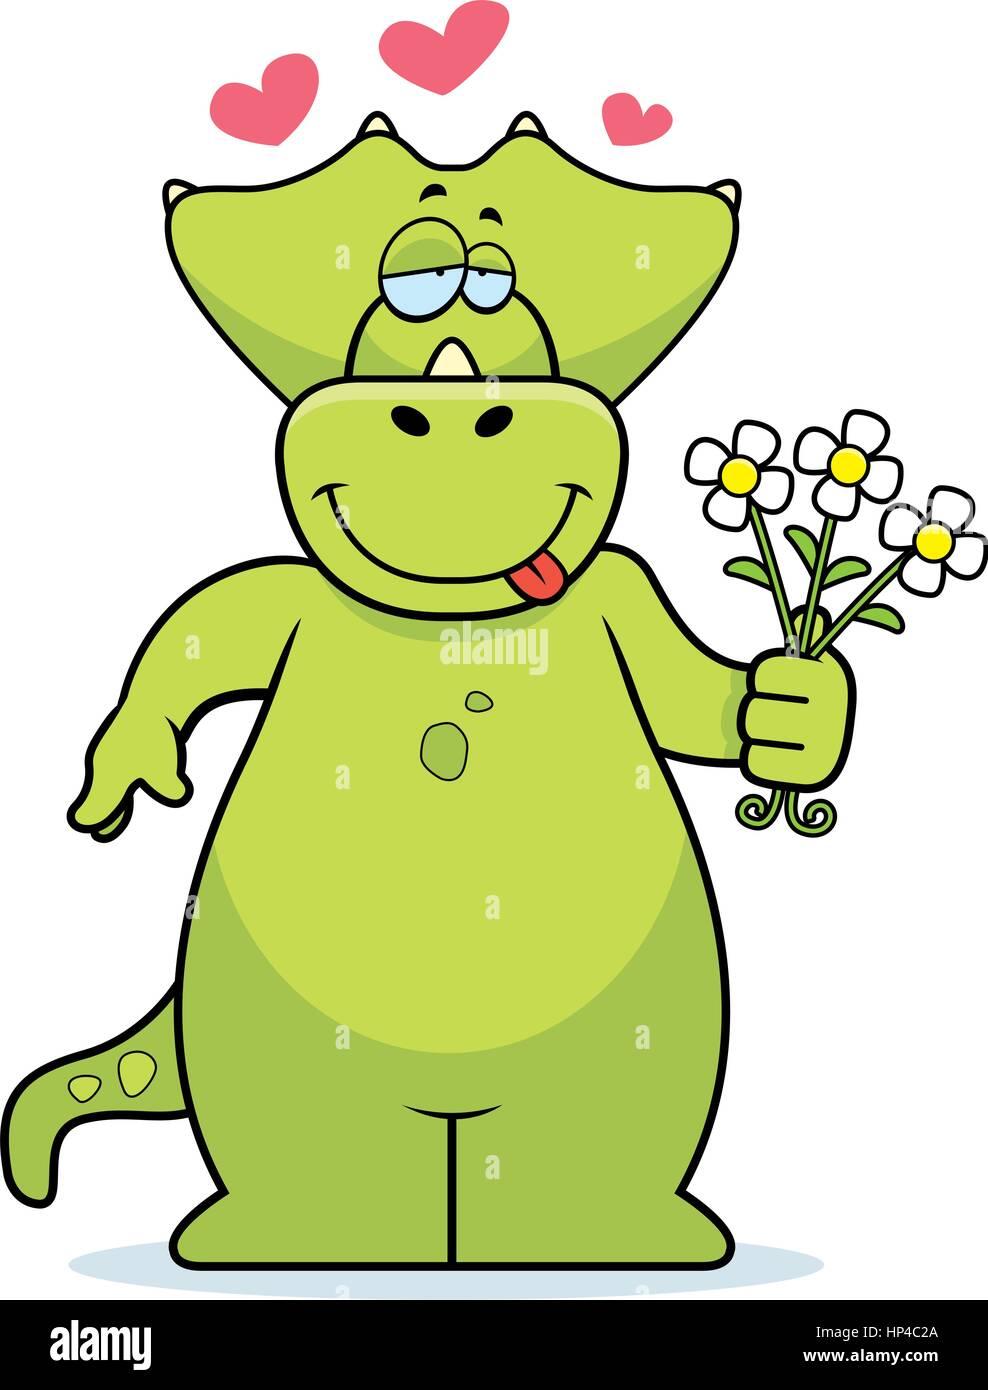 A Happy Cartoon Dinosaur With A Bouquet Of Flowers Stock Vector Art